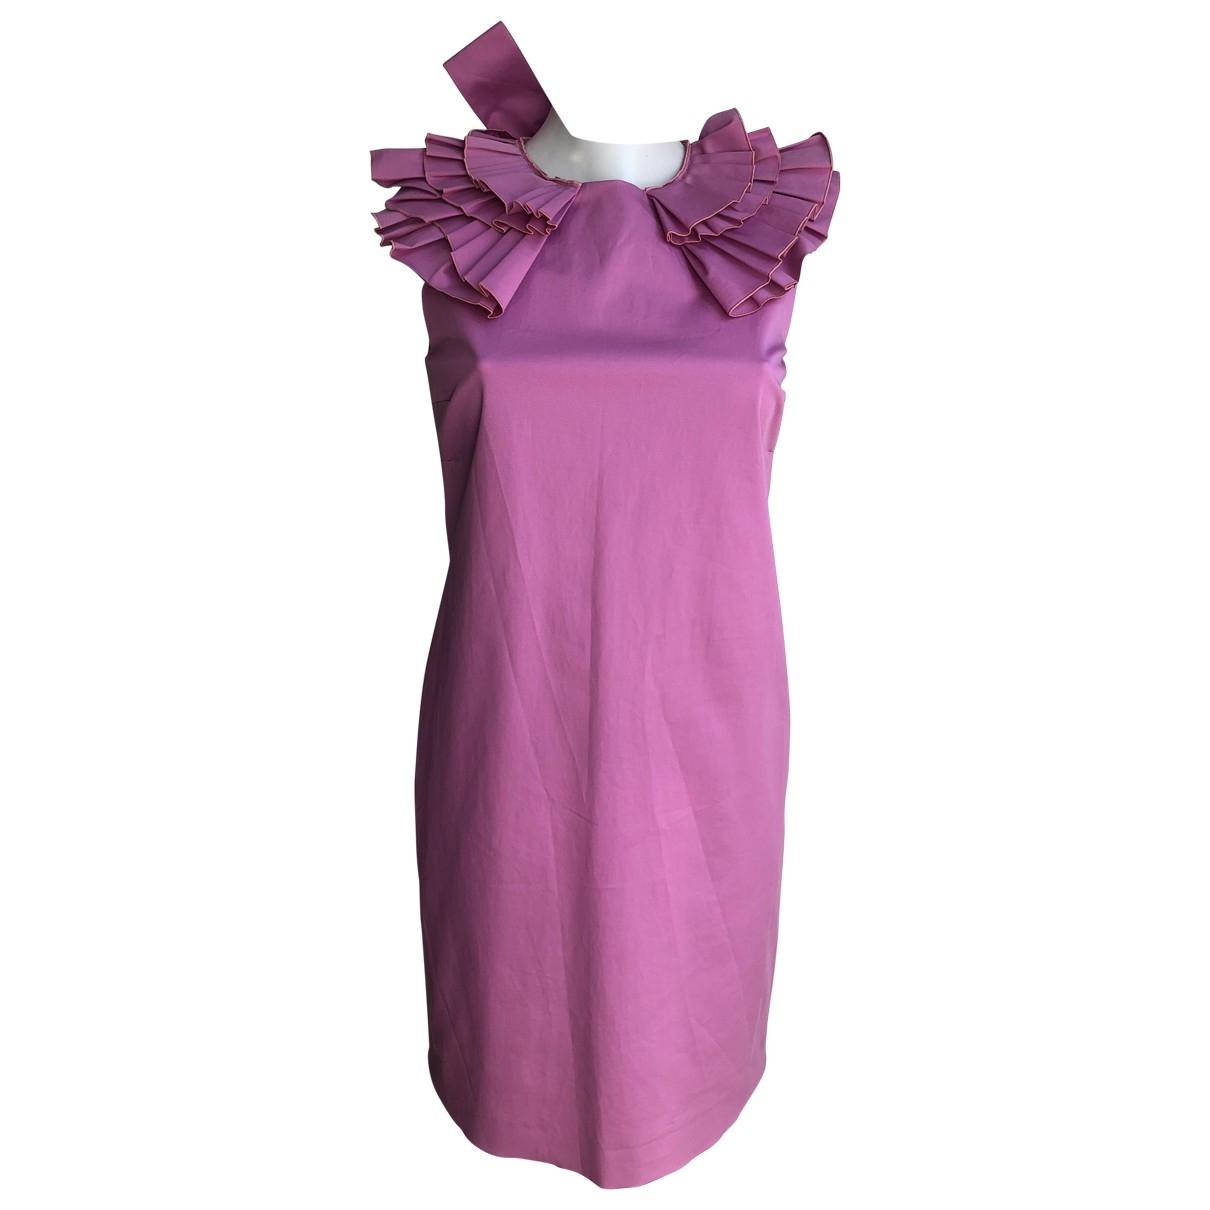 Valentino Garavani \N Pink Cotton dress for Women 40 IT